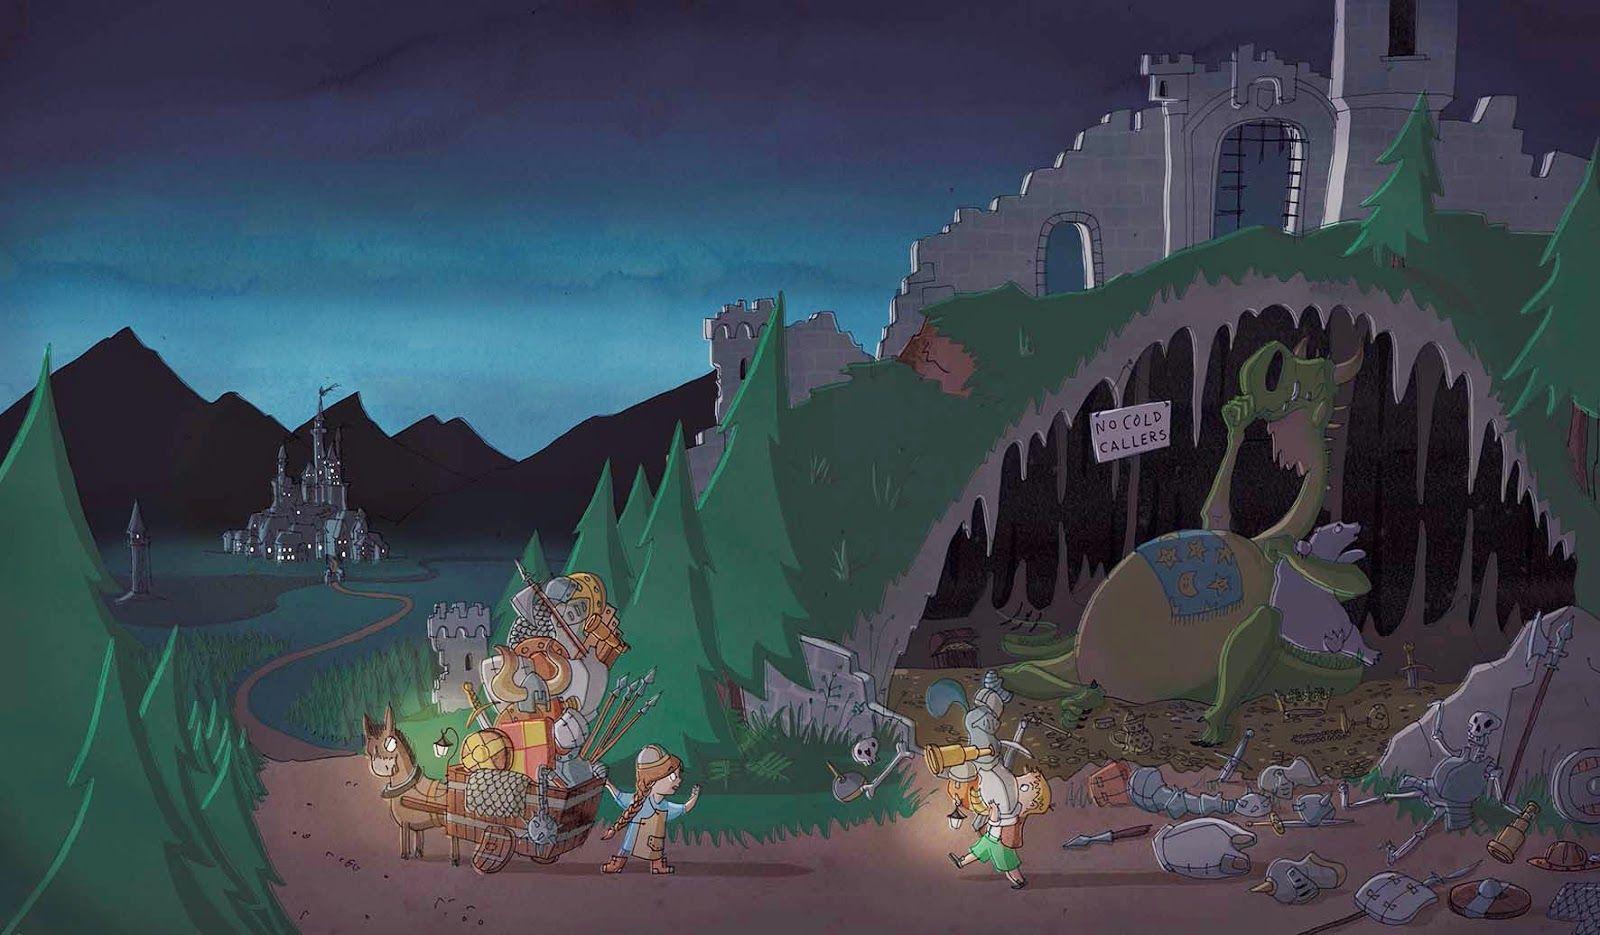 Flamethrottle's cave